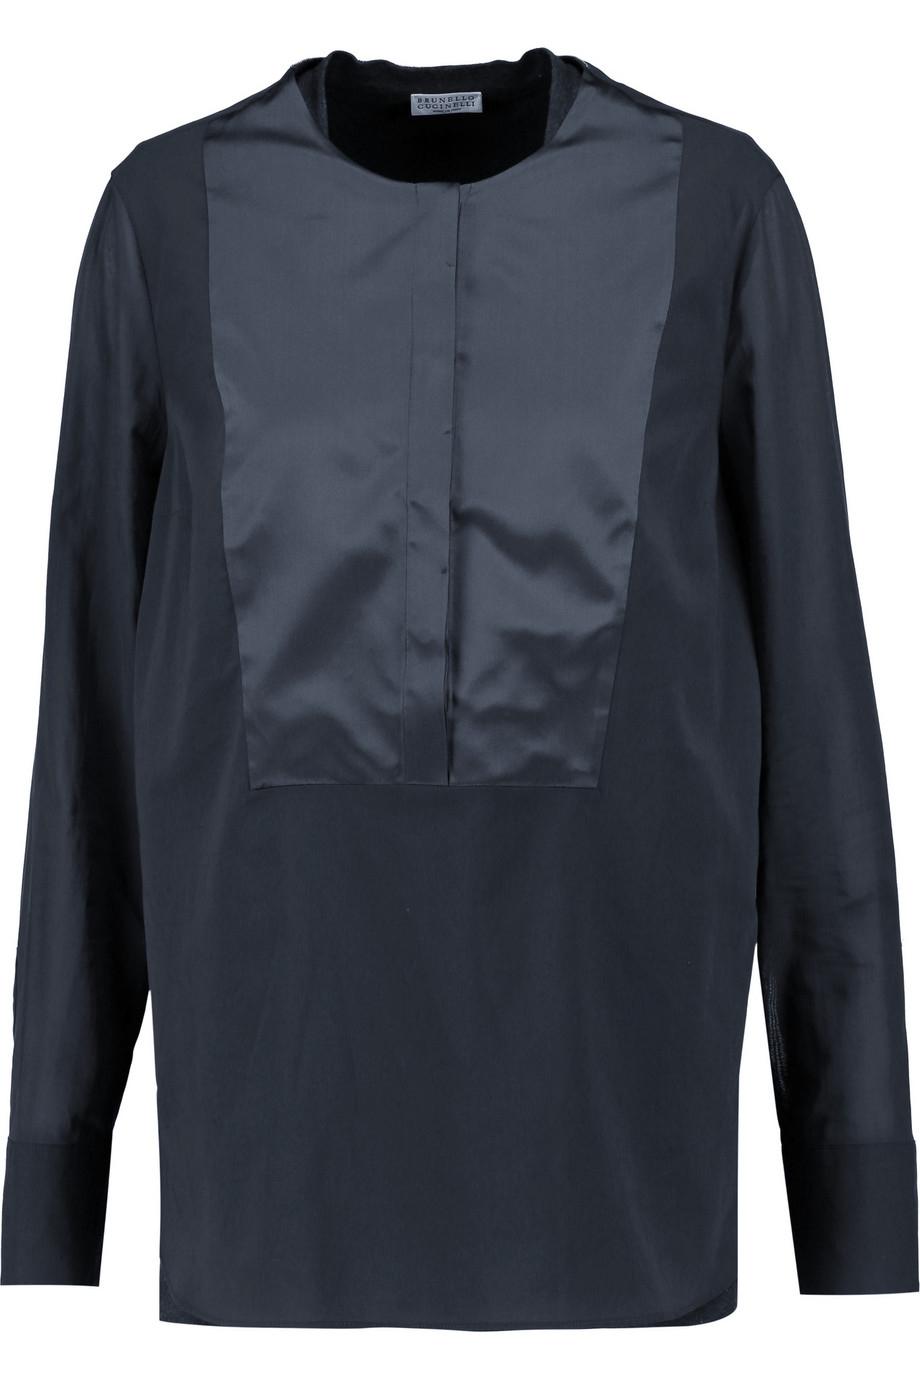 Gray Cotton Blouse 13